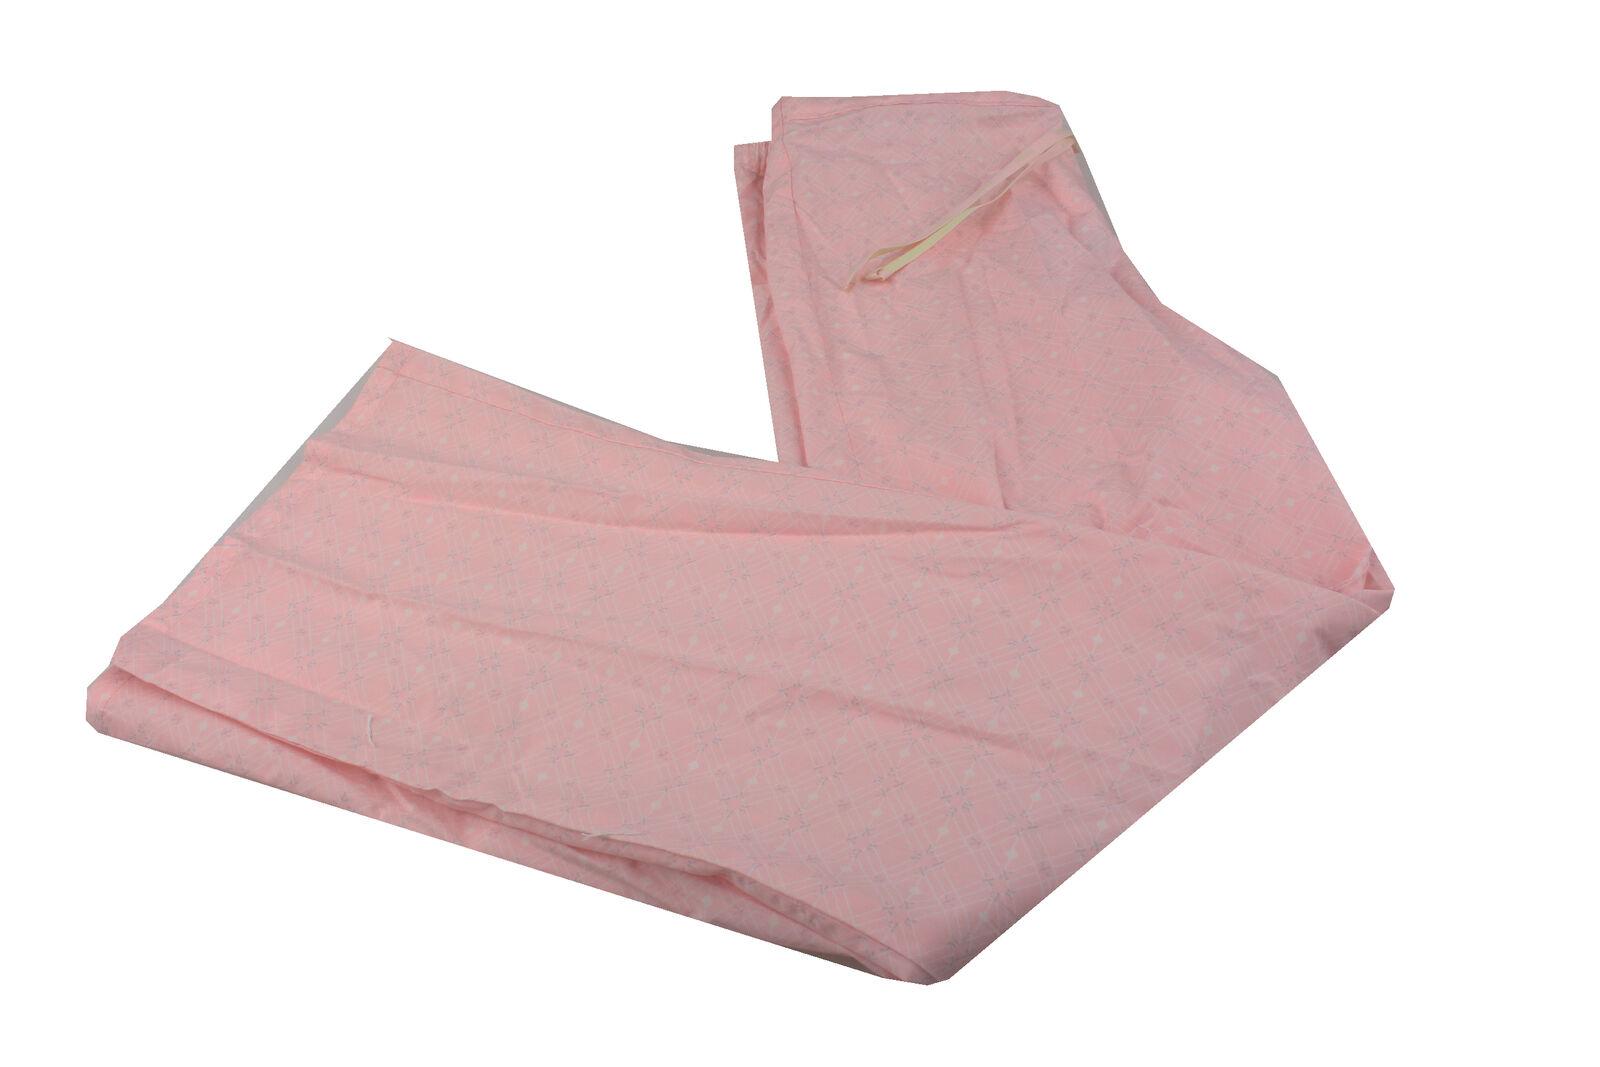 Mexx Schlafanzughose Gr: S/36 rosa Neu